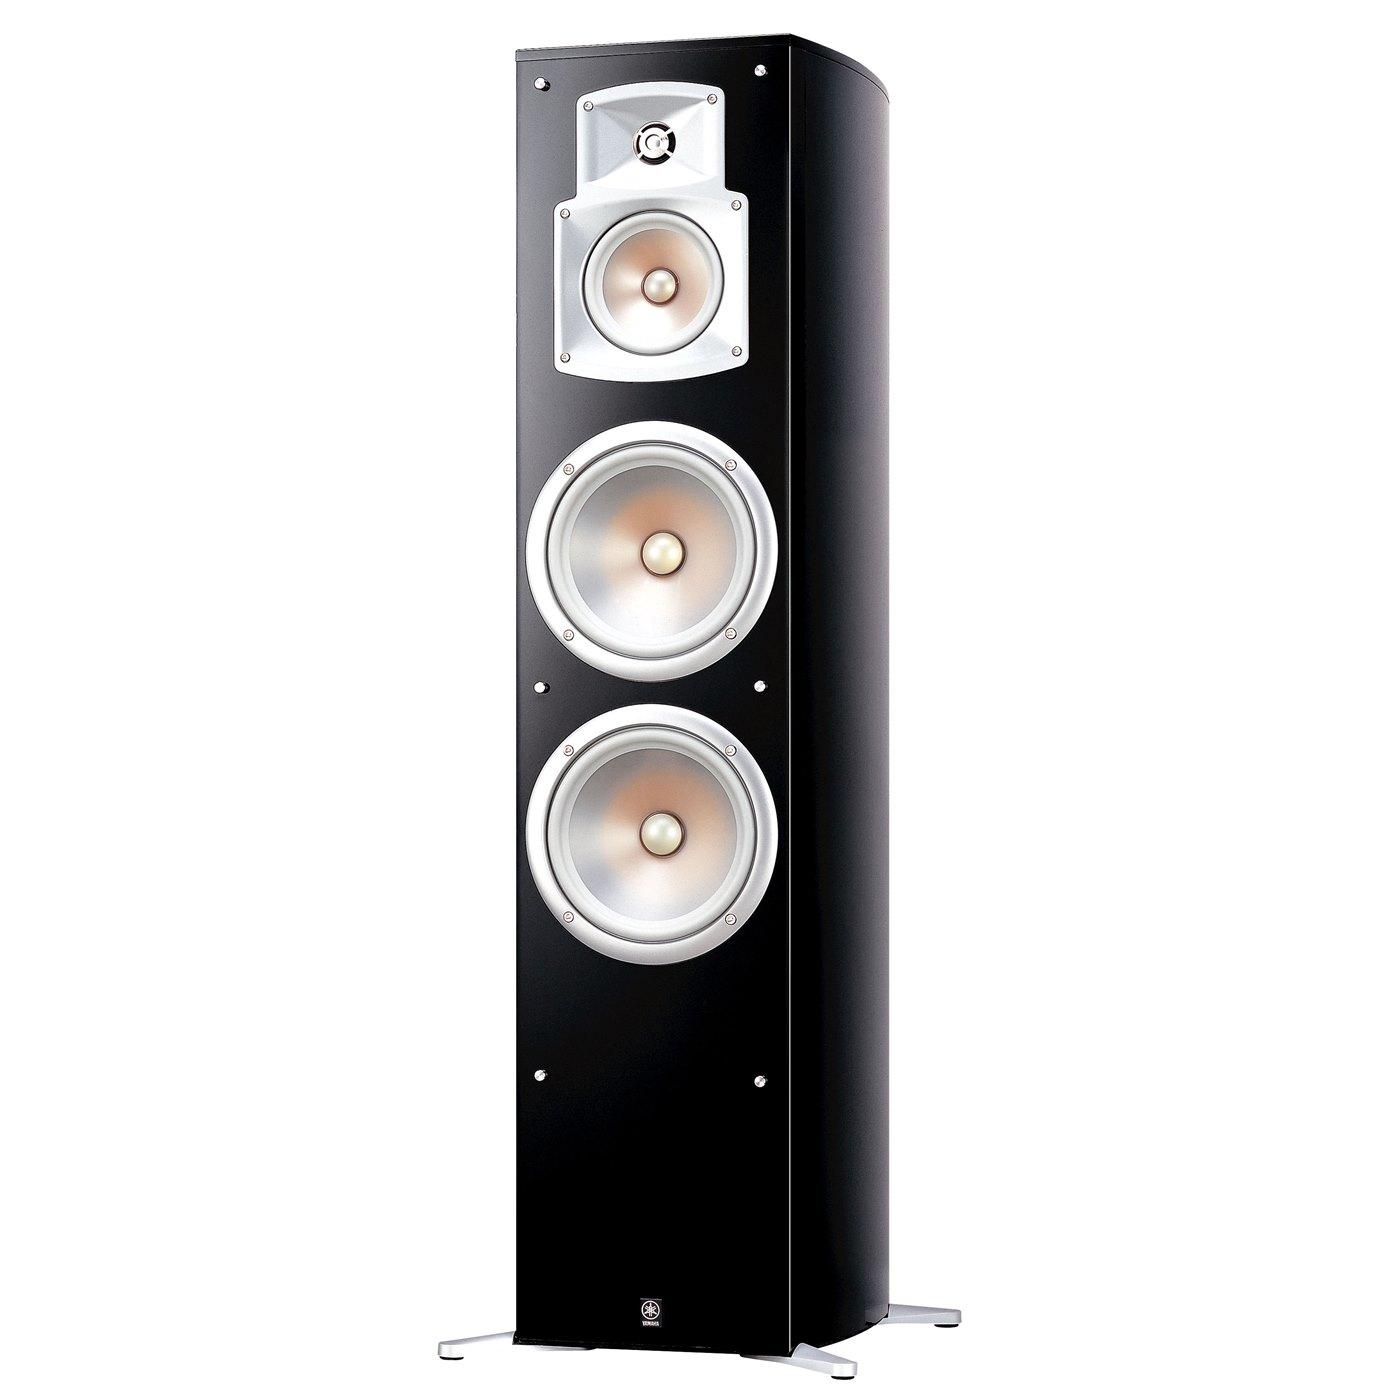 Yamaha NS-777 Floorstanding Home Theater Speaker